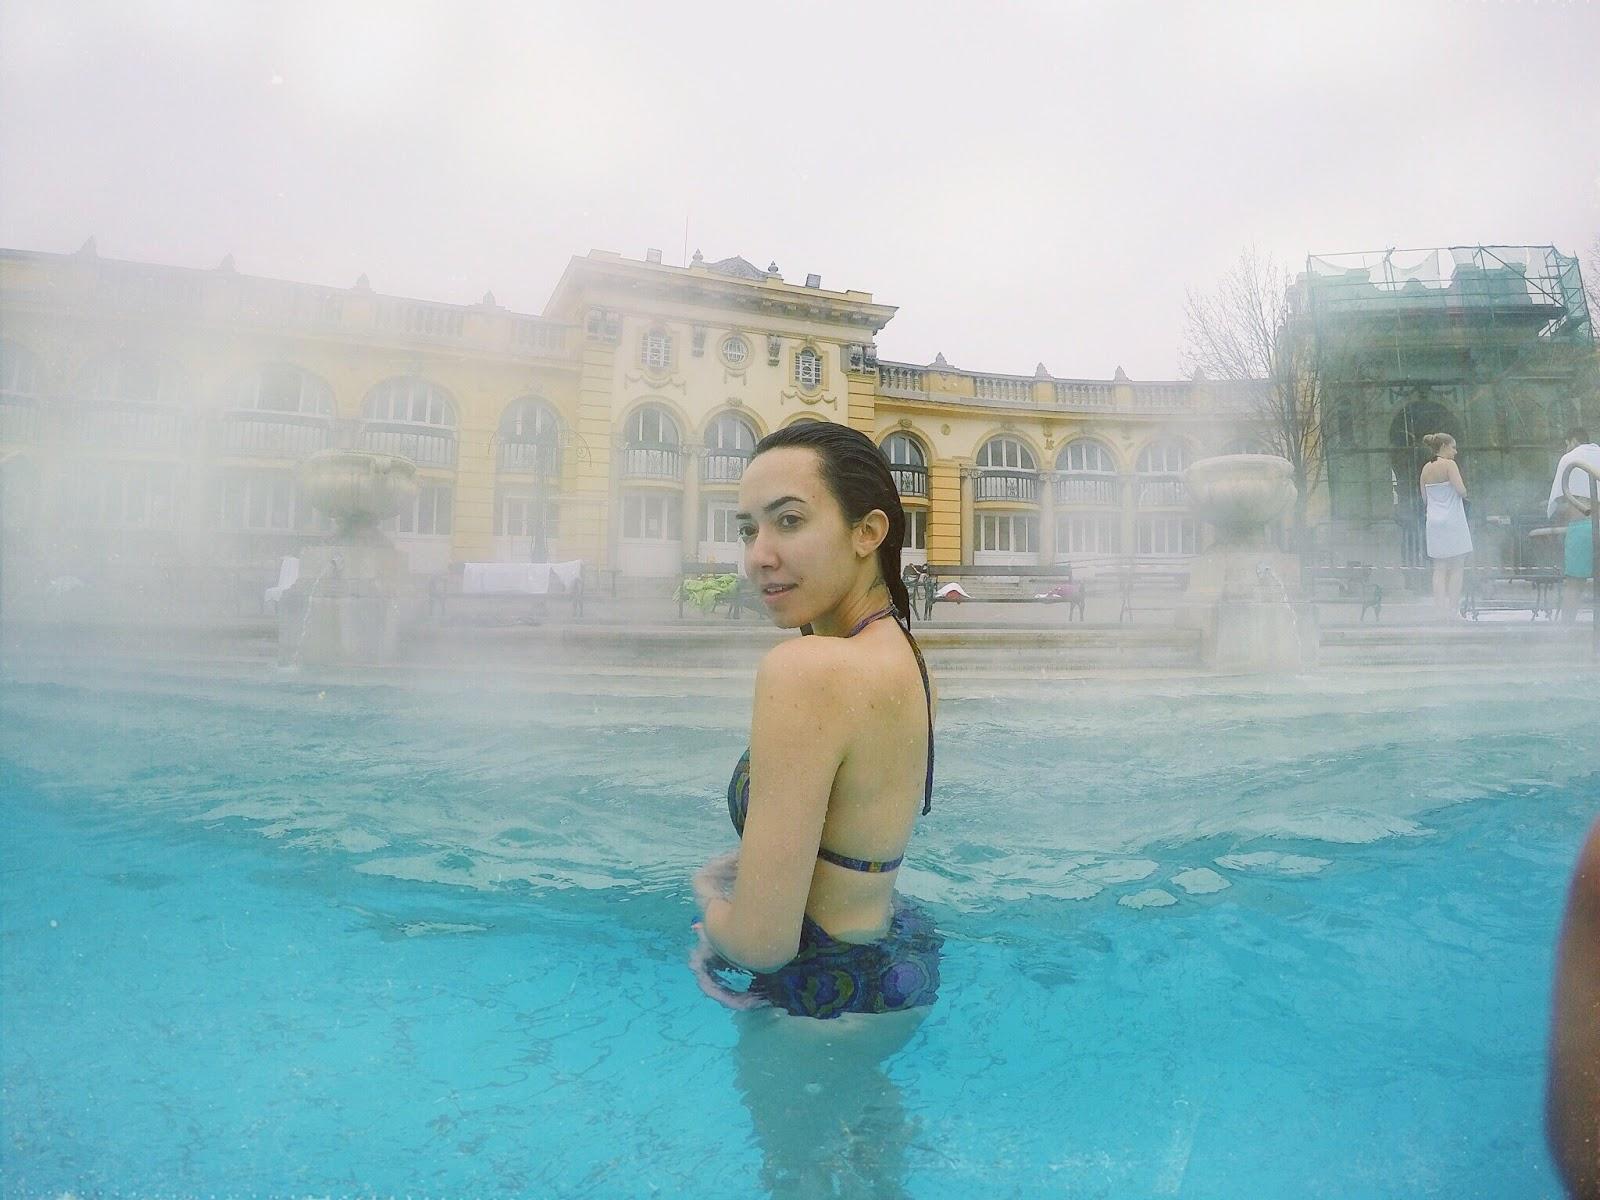 lifesthayle-budapest-szechenyi-baths.JPG